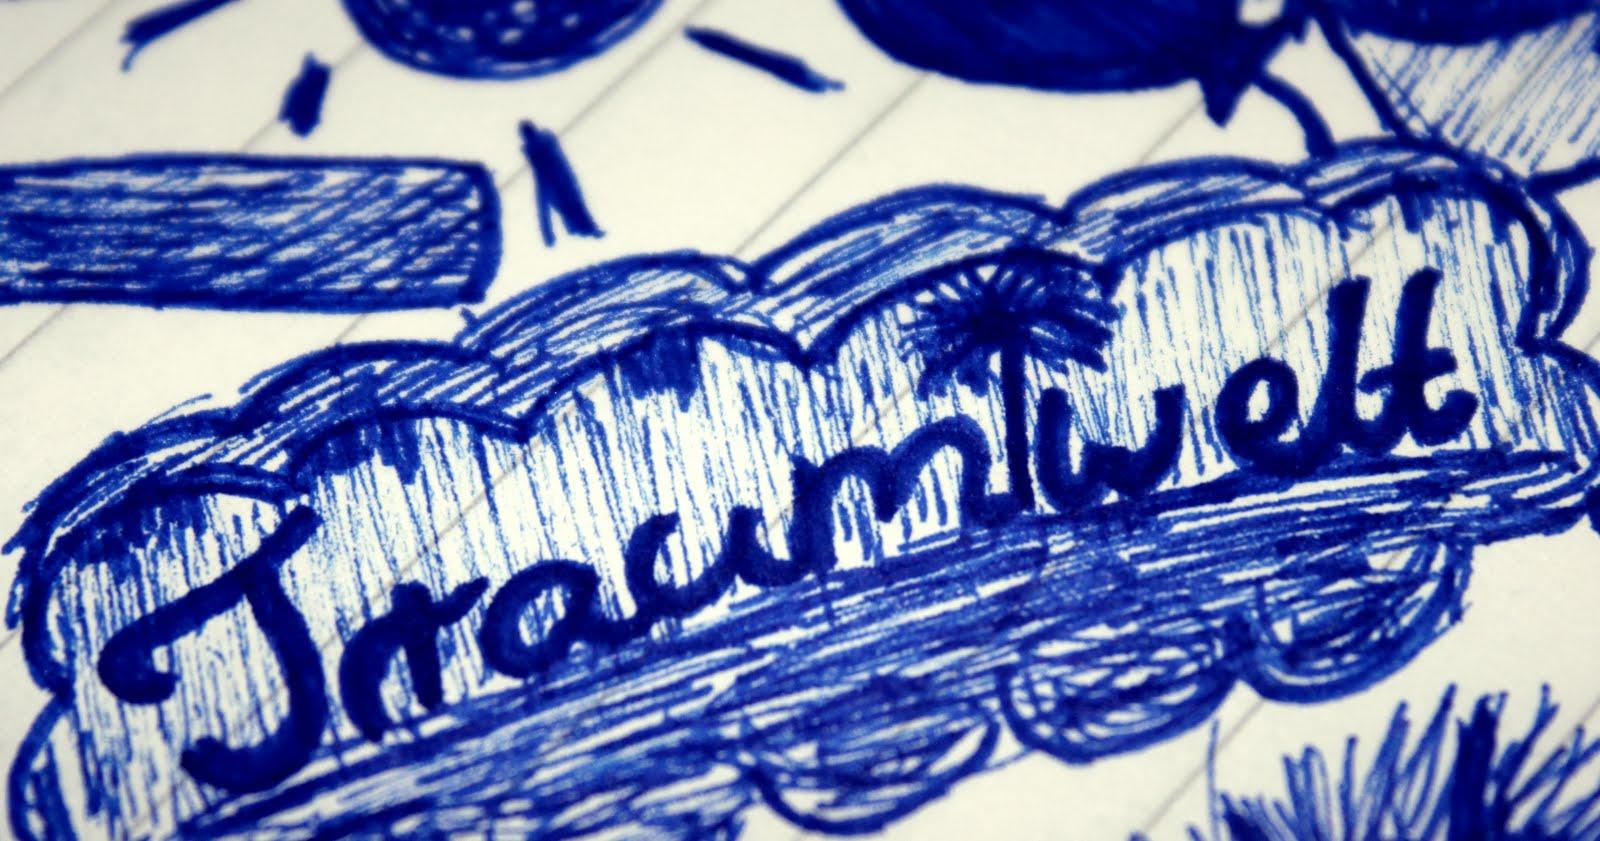 Traumwelt